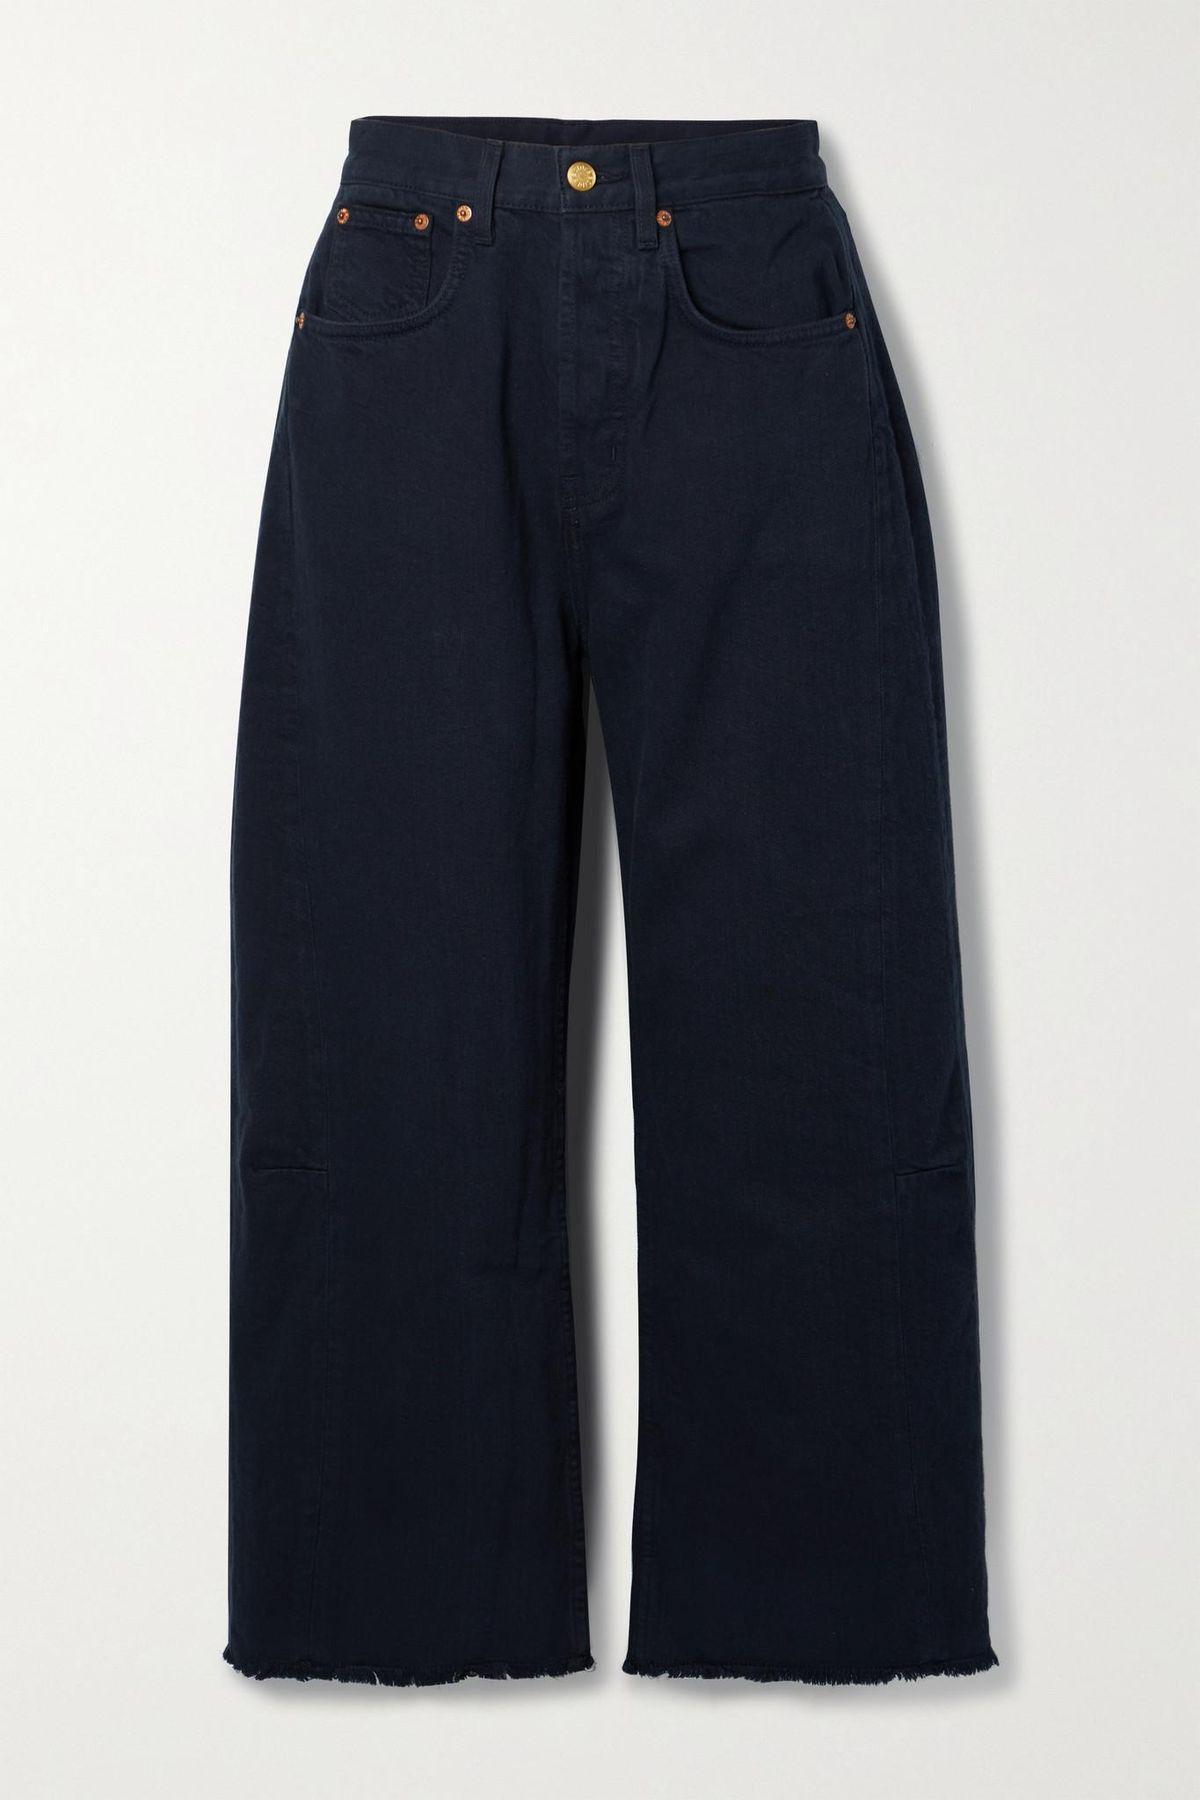 b sides lasso high rise wide leg jeans